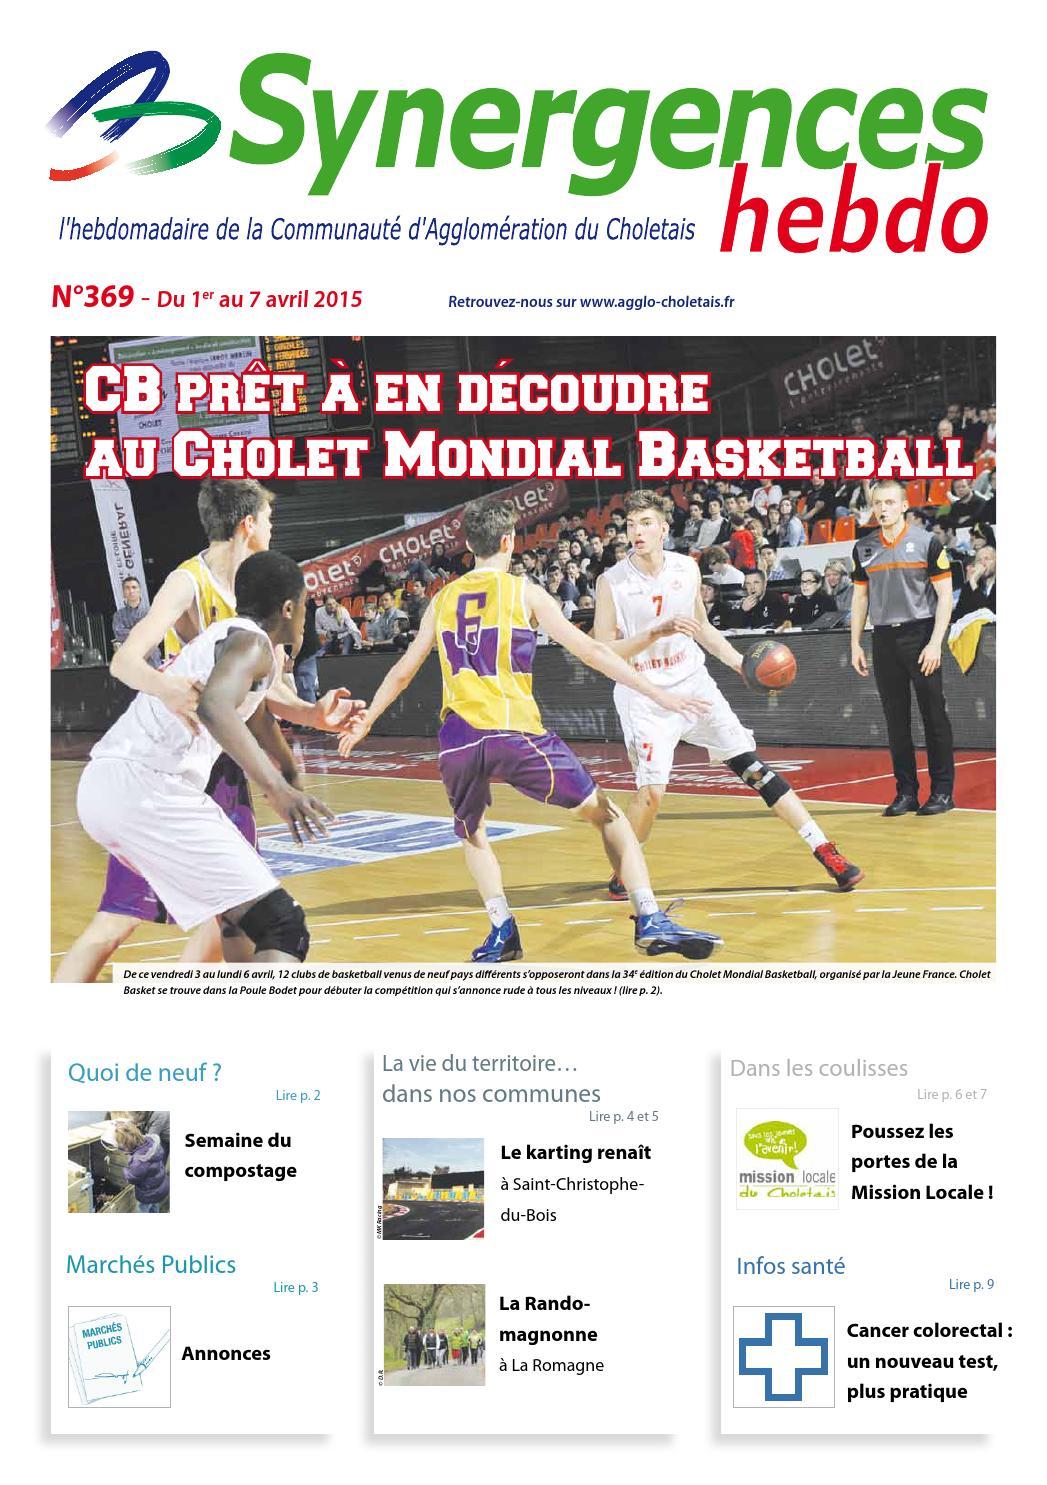 Synergences hebdo n°369 by Agglomération du Choletais - issuu